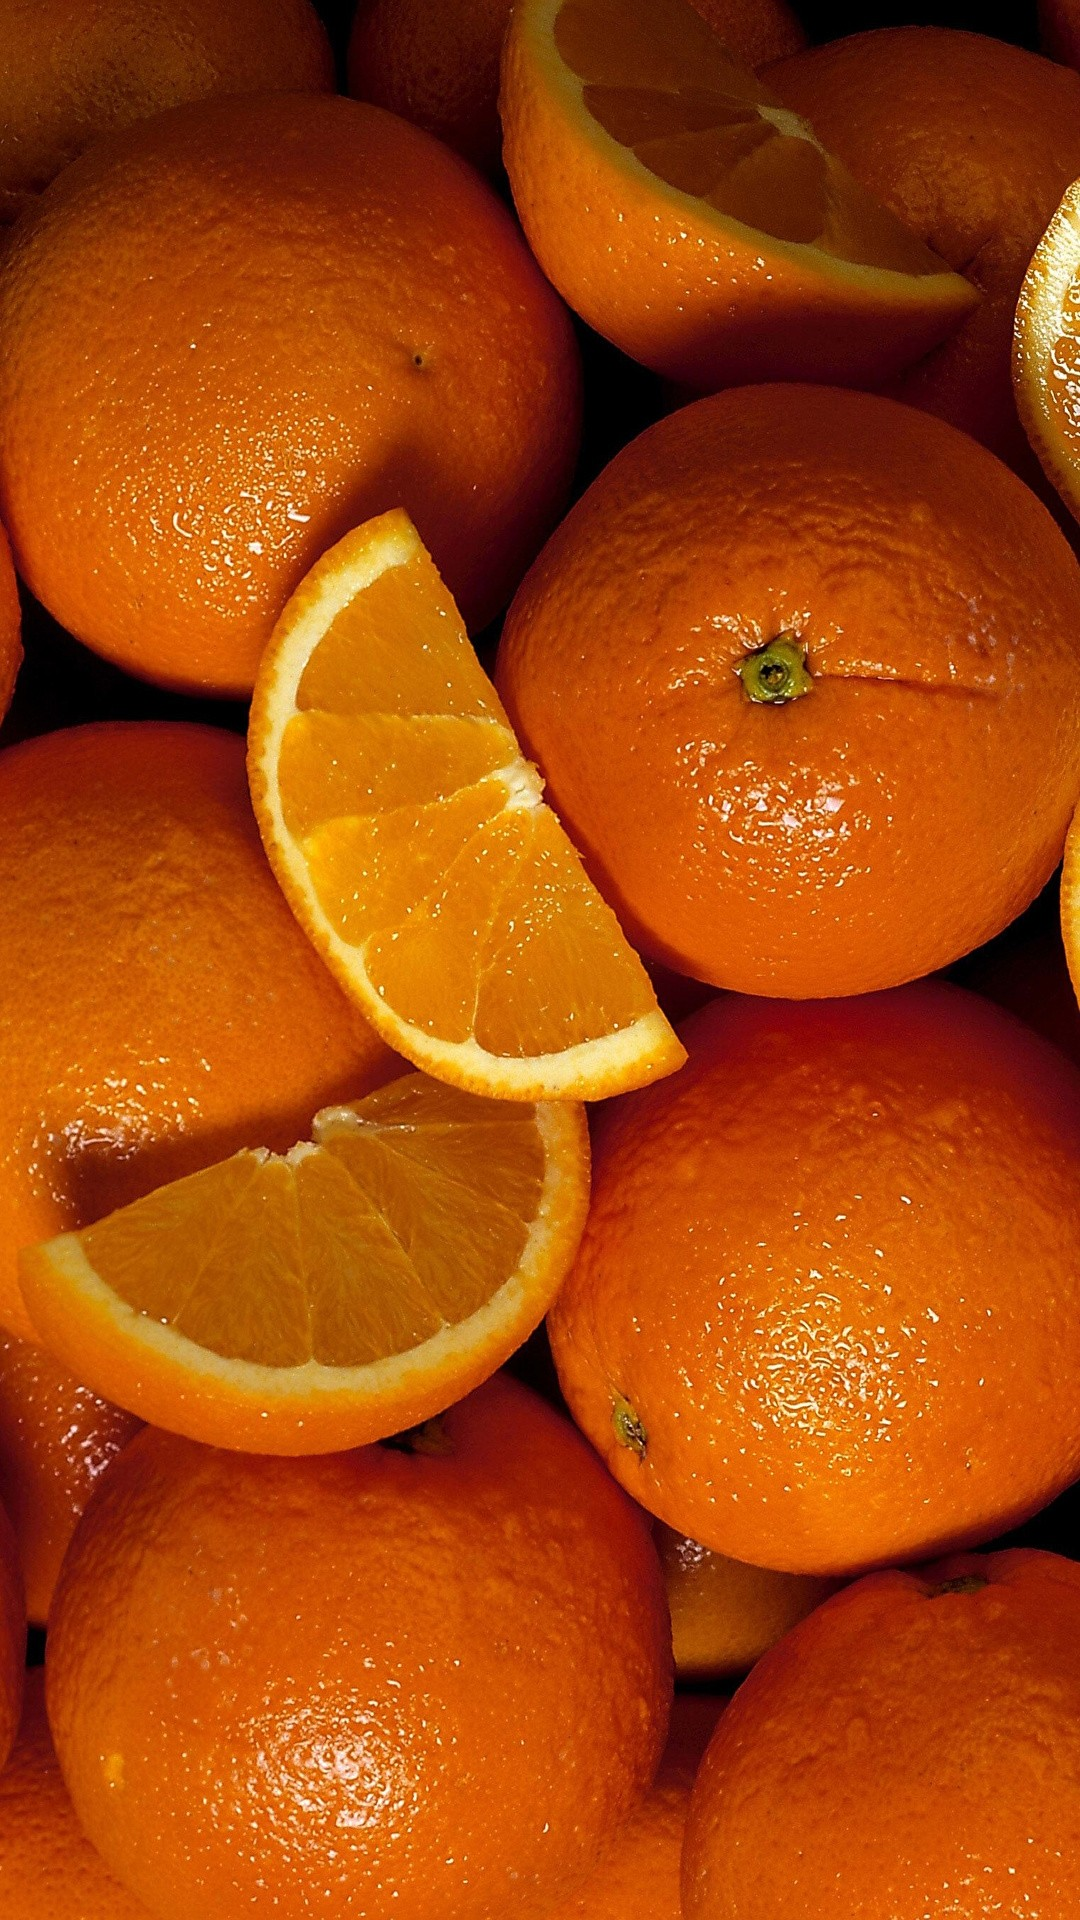 Orange phone wallpaper hd